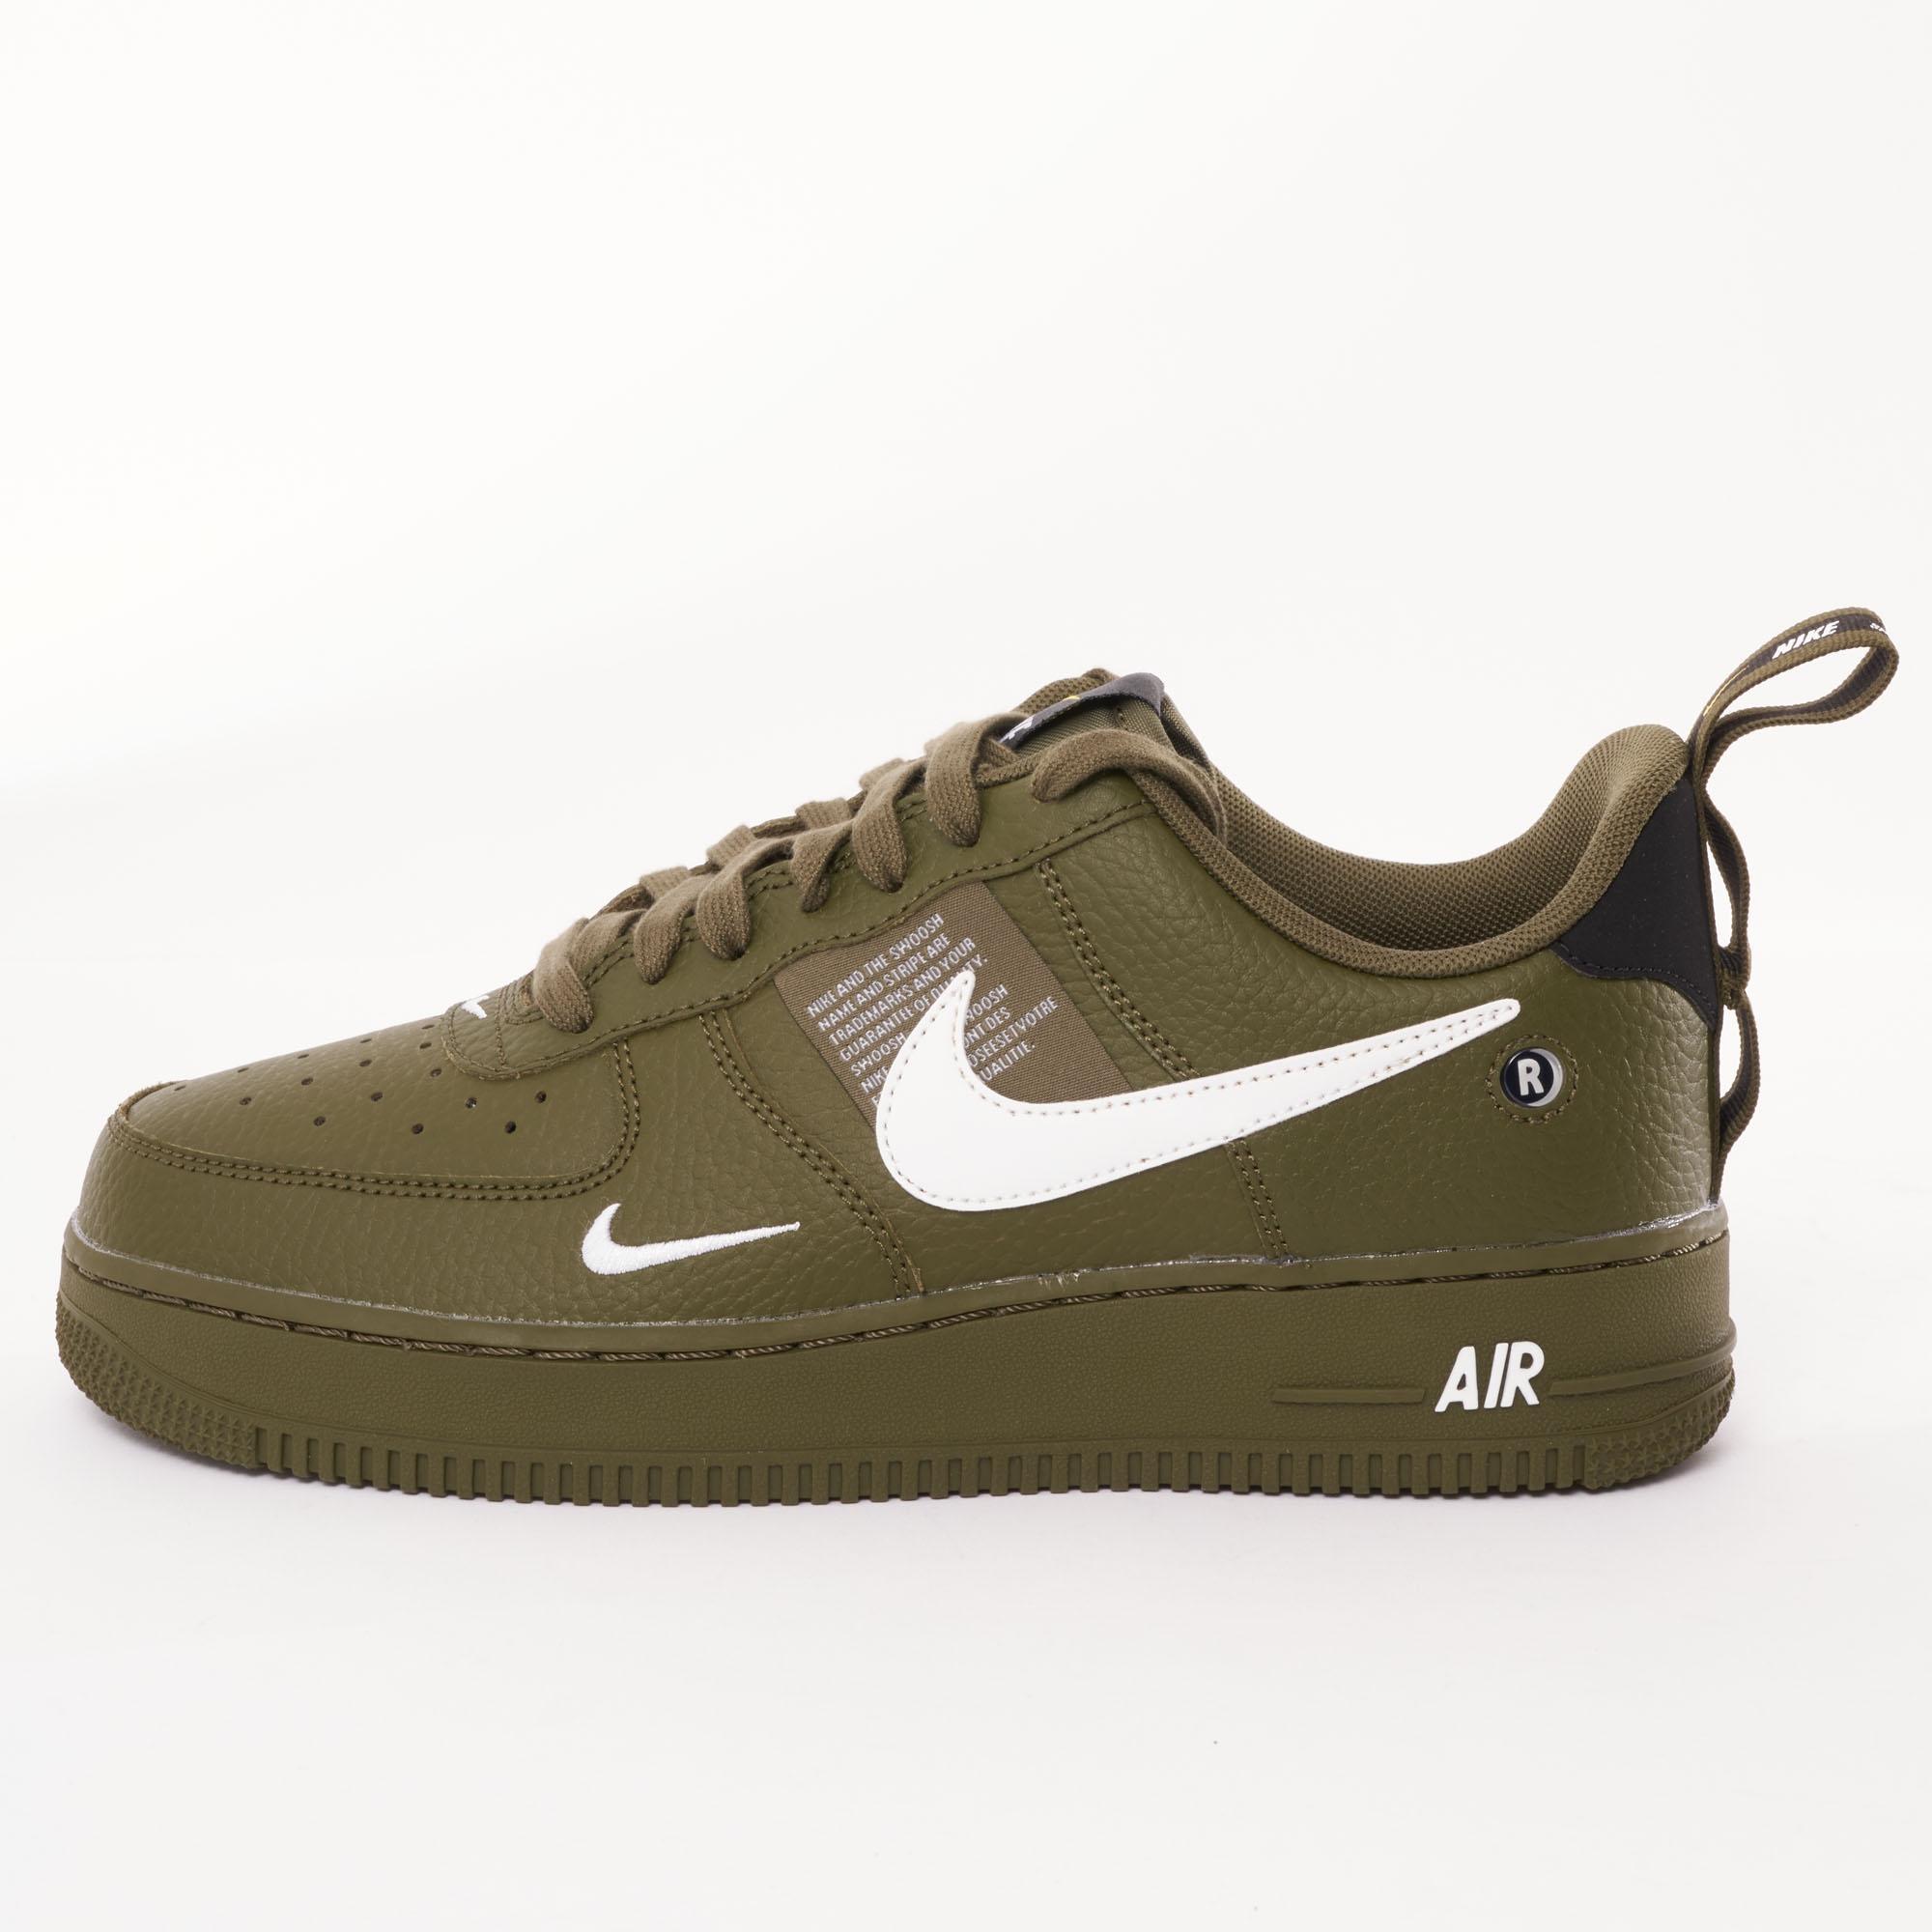 823e155b67bdca Nike Air Force 1  07 Lv8 Utility in Green - Lyst